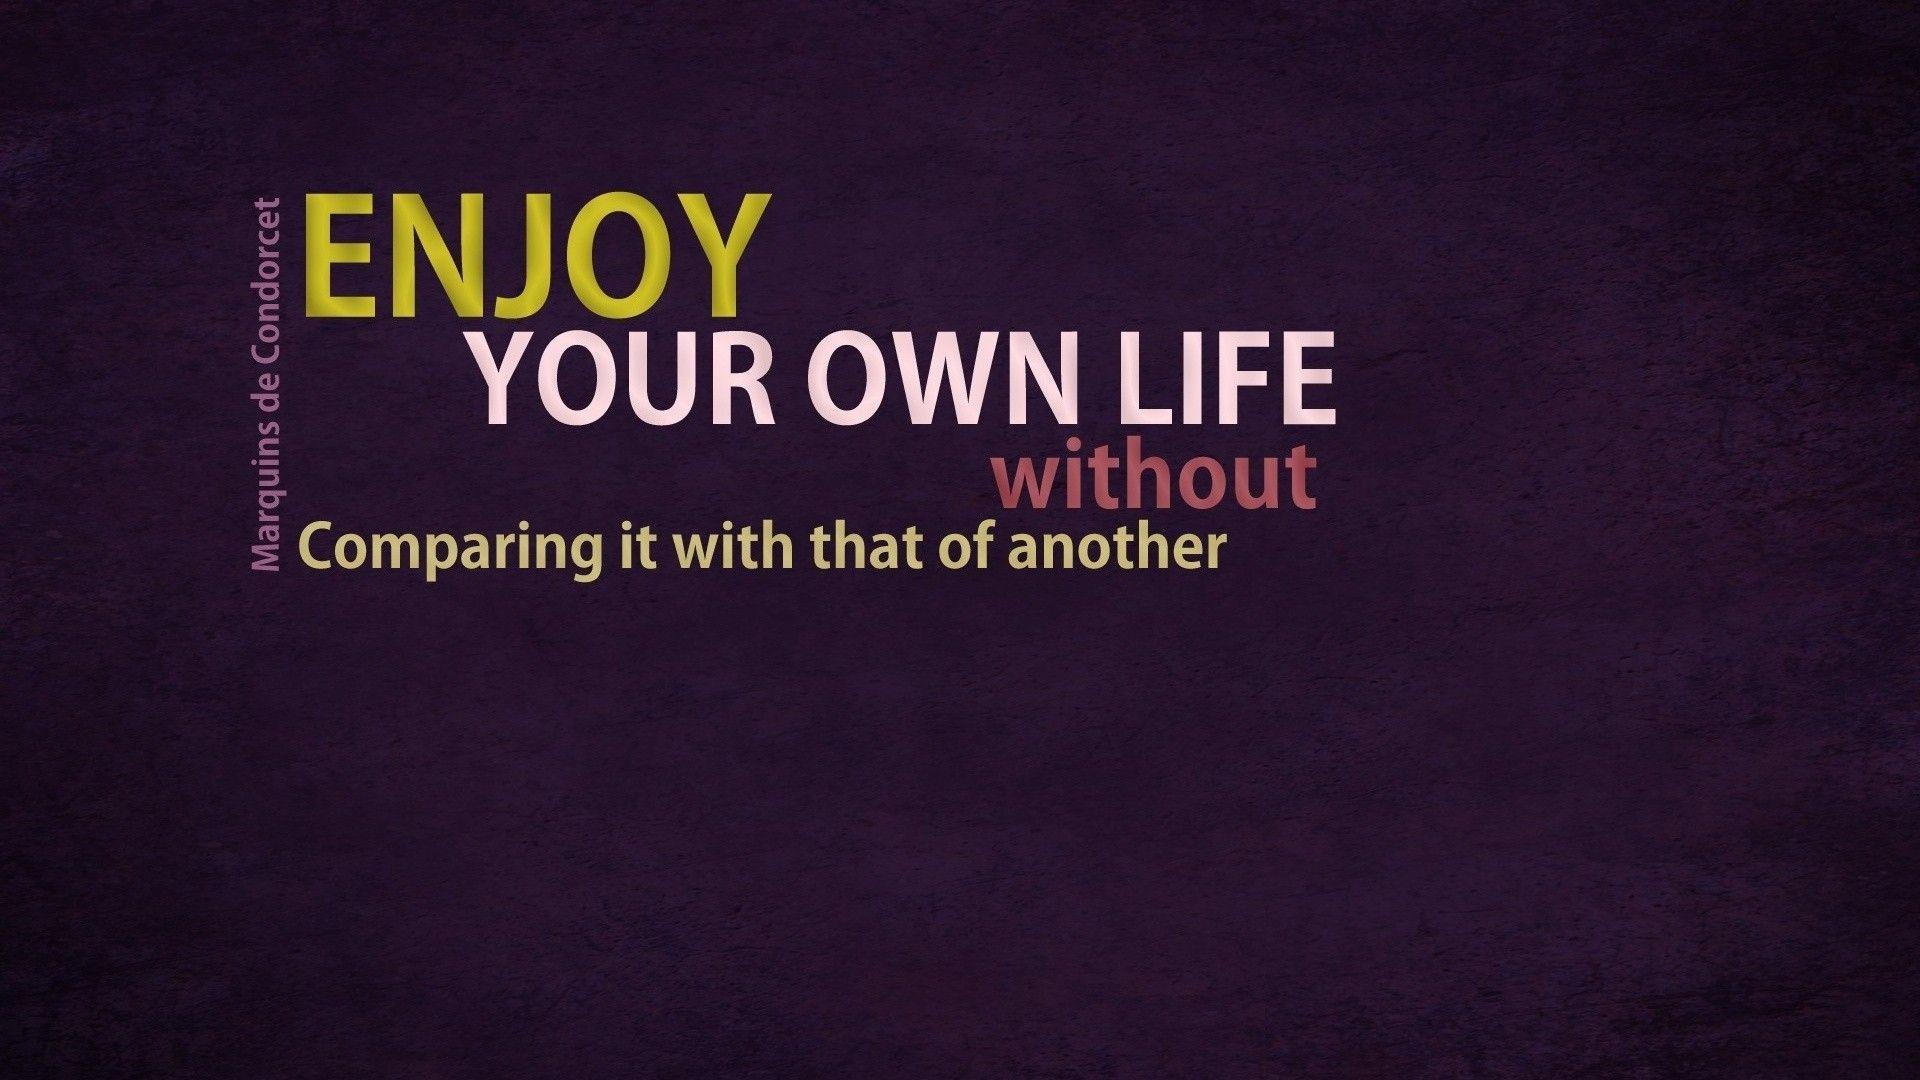 Enjoy Inspirational Quote Wallpaper 1920x1080